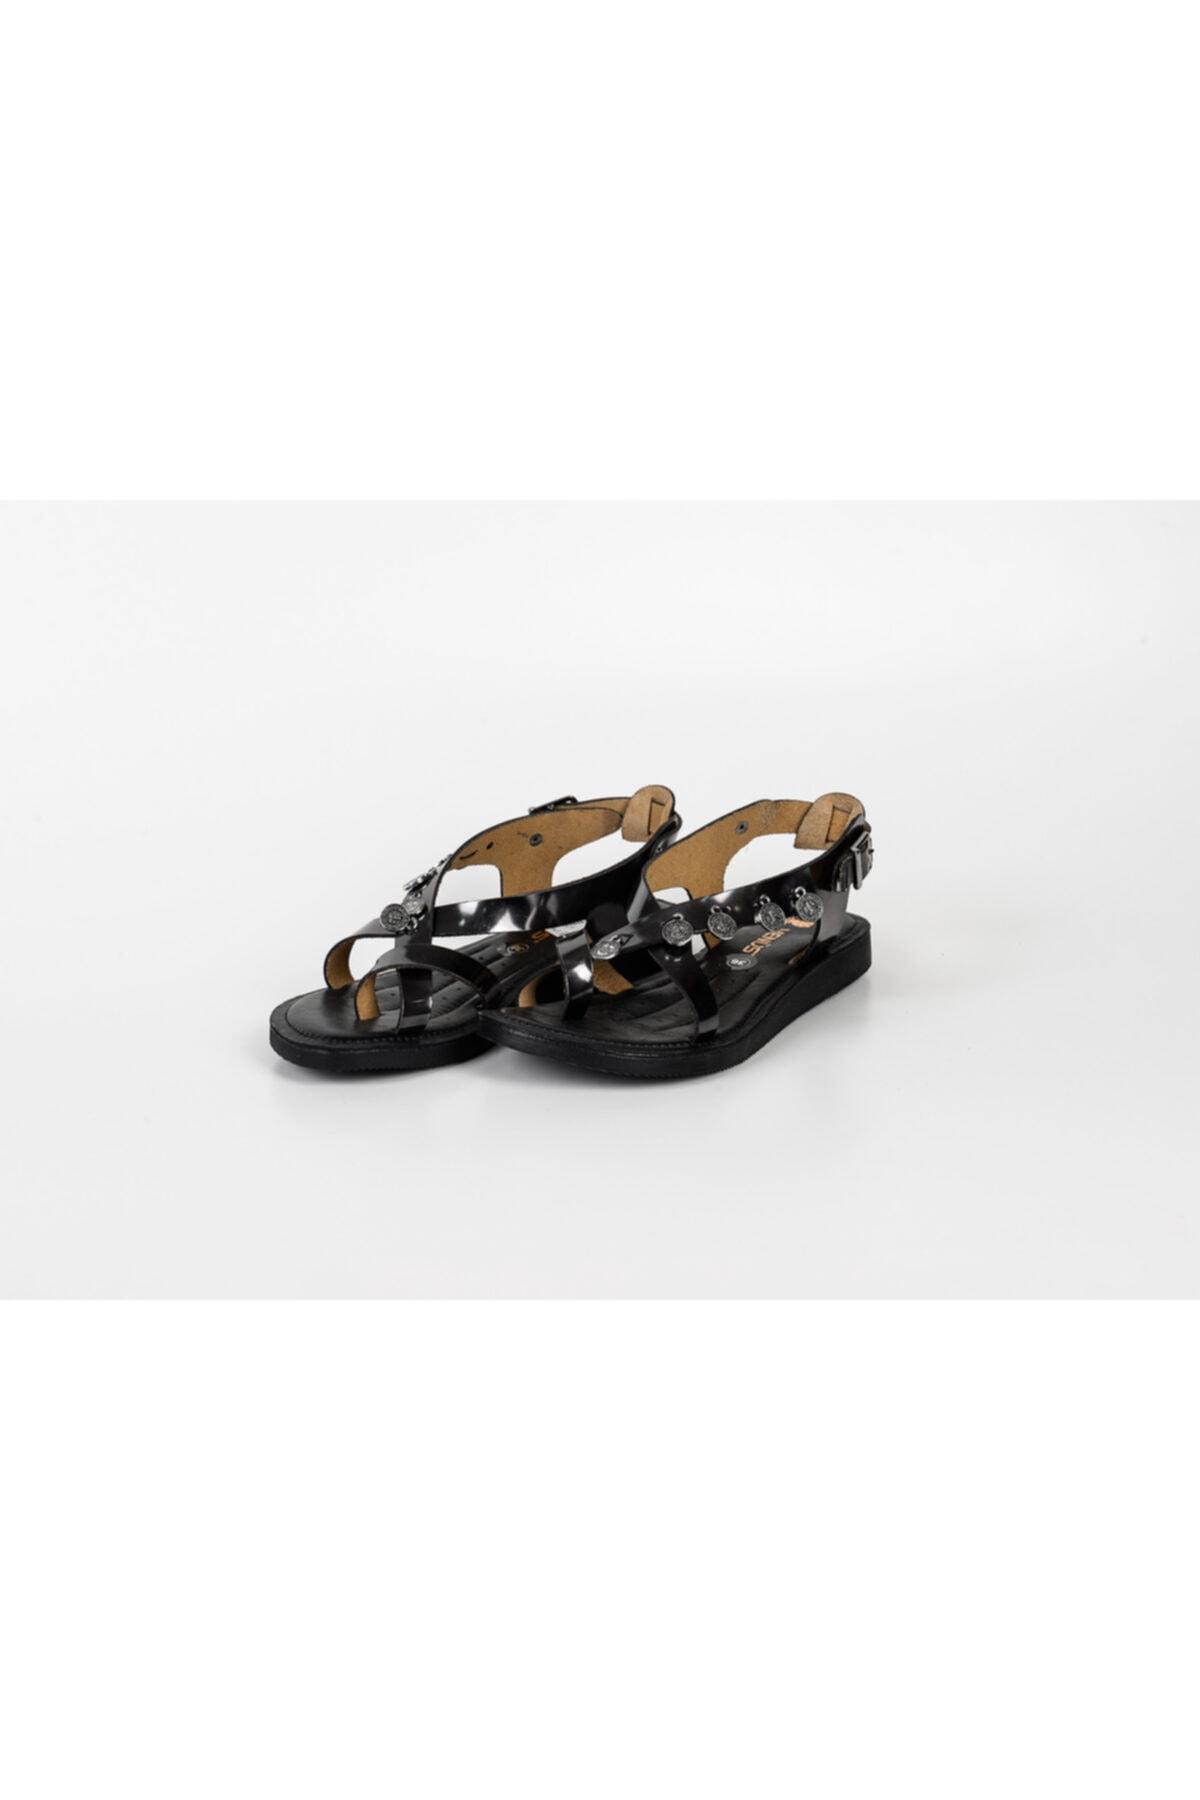 Venüs 20980209 Bayan Deri Sandalet Ortopedik 1